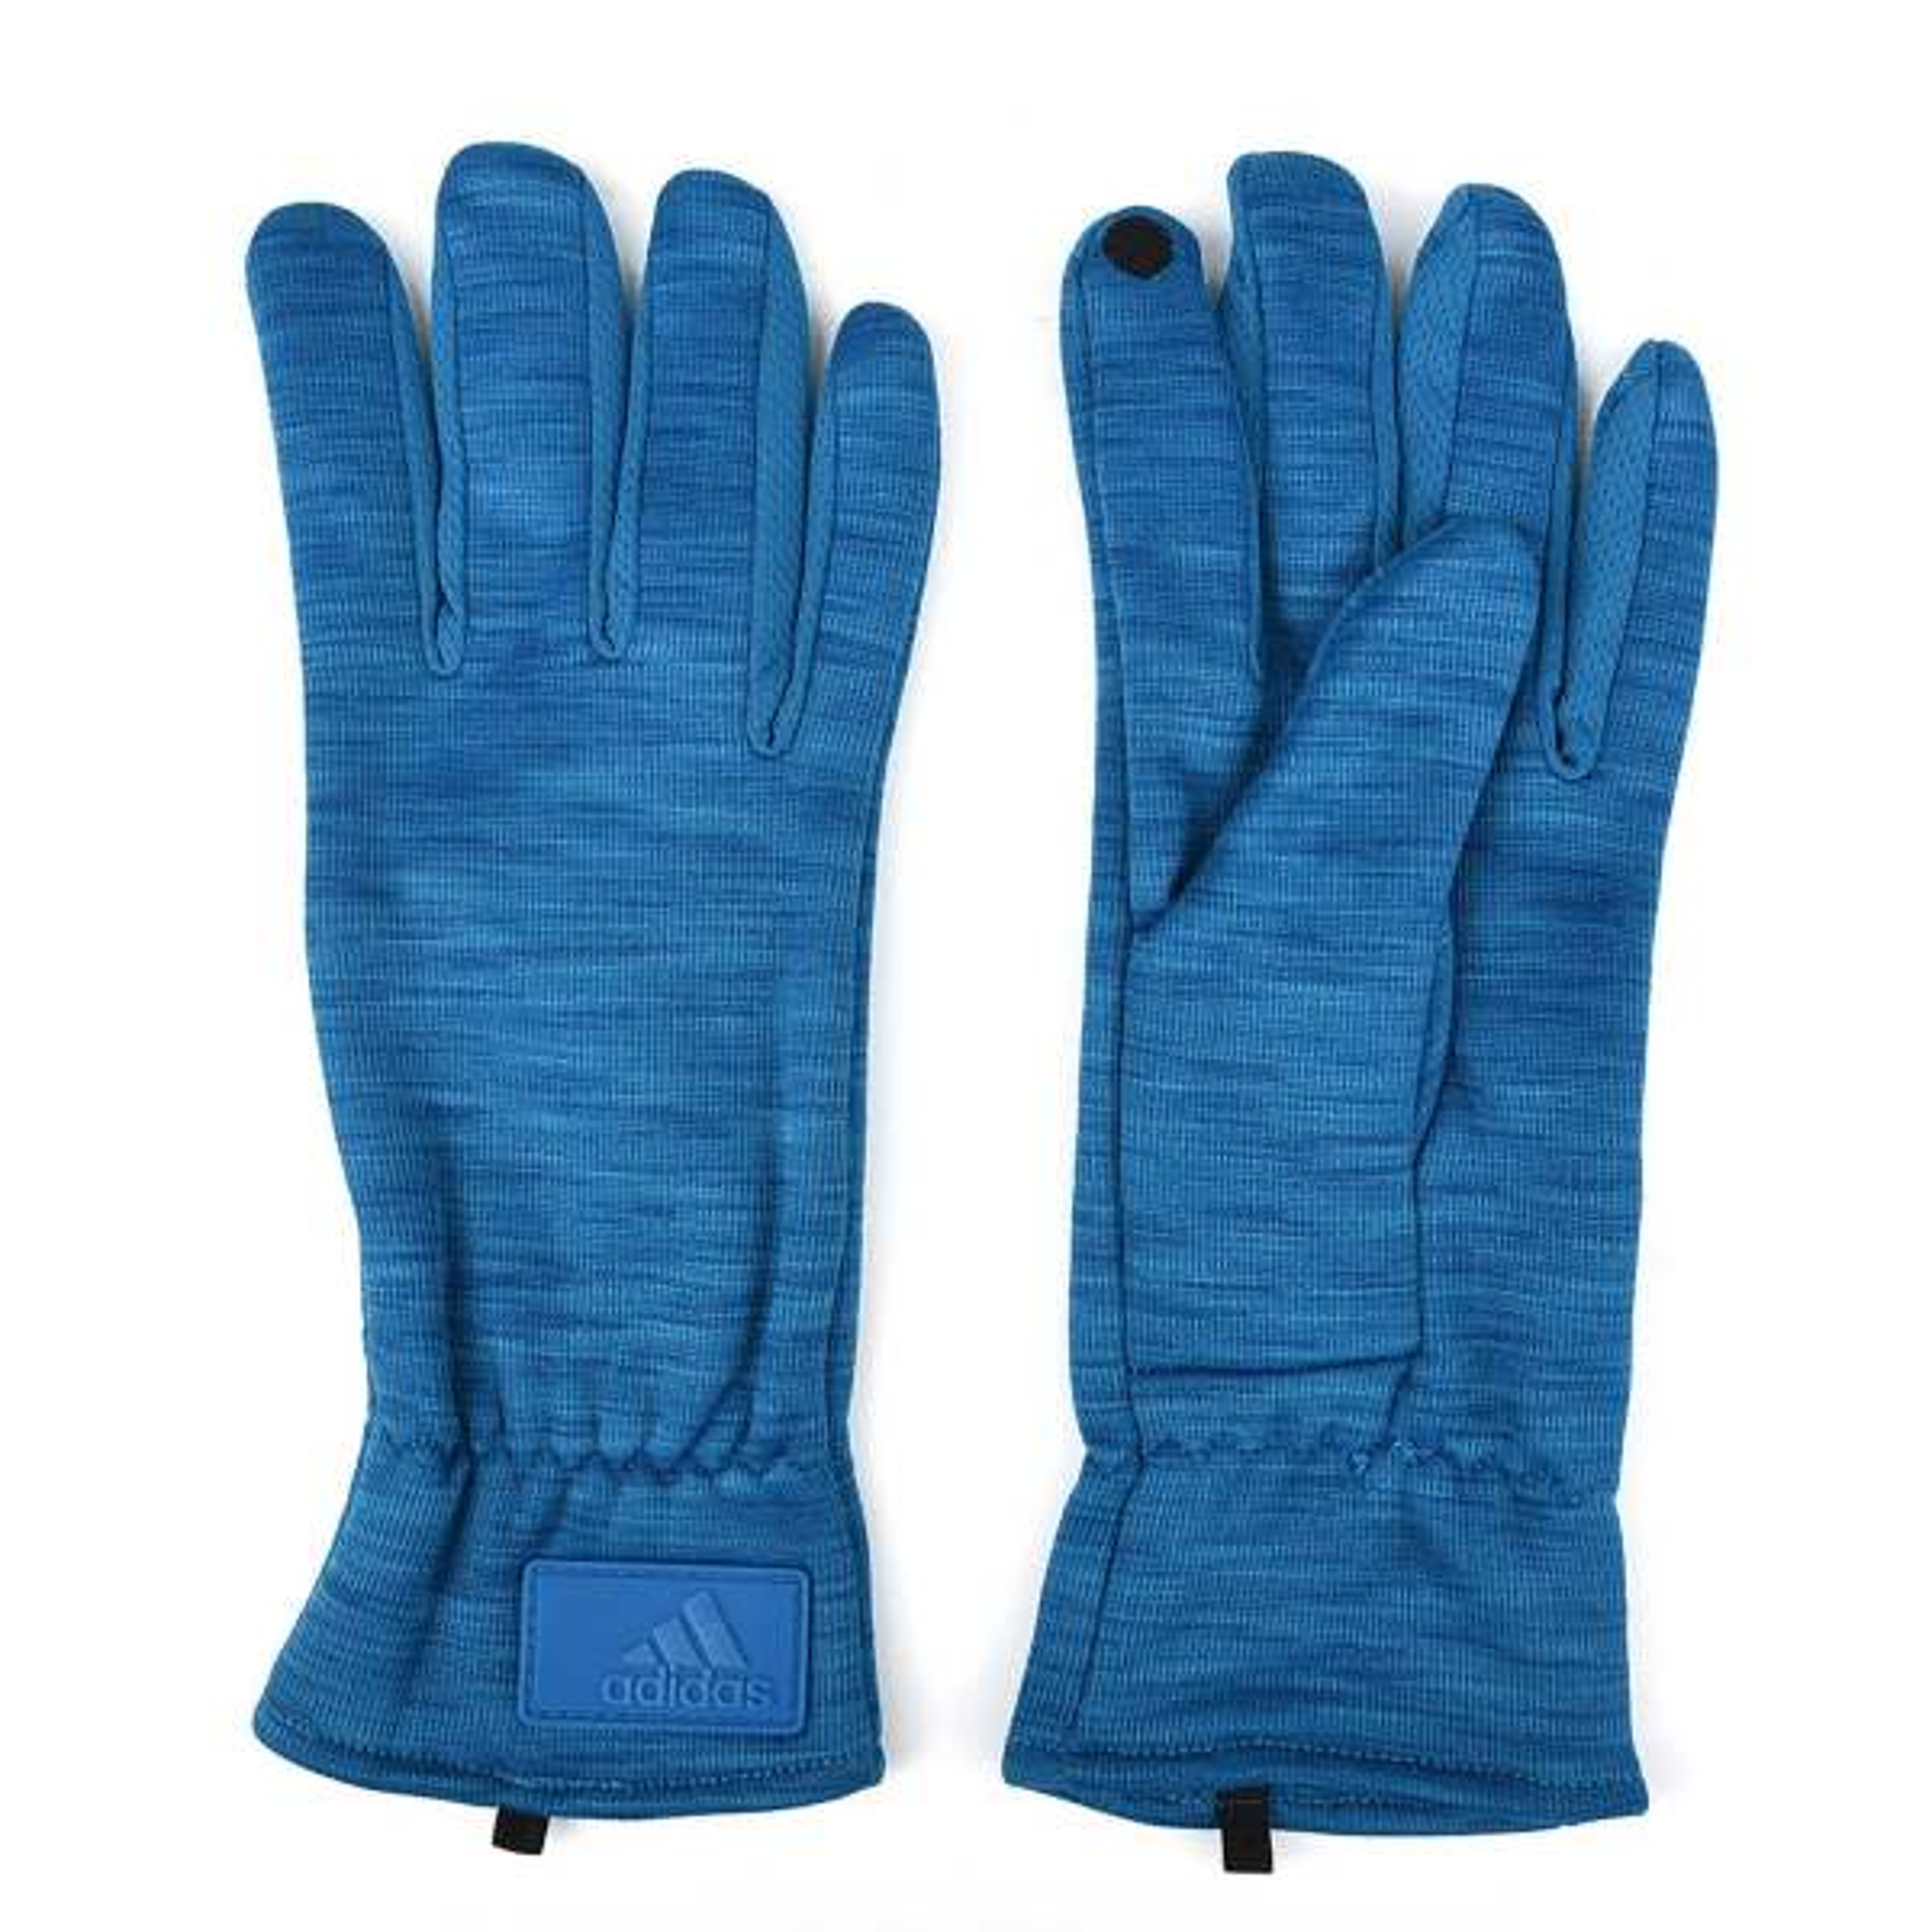 دستکش مردانه آدیداس مدل AY8466